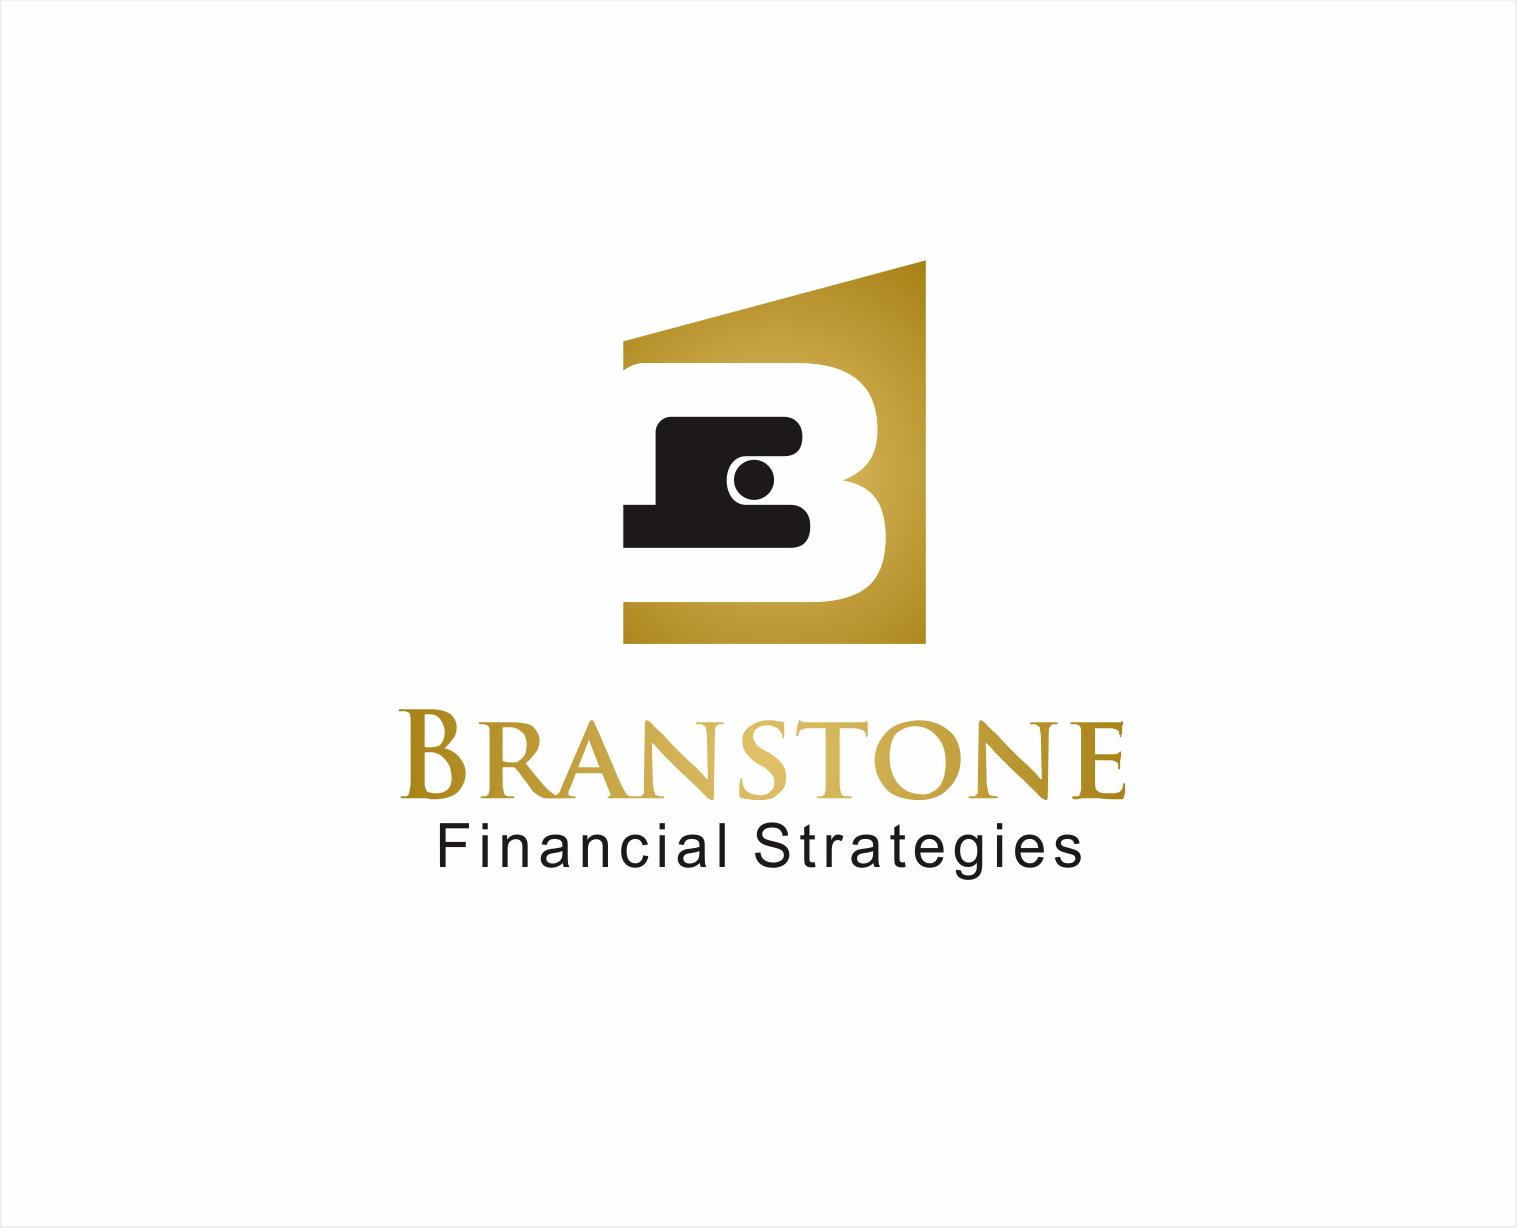 Logo Design by Armada Jamaluddin - Entry No. 204 in the Logo Design Contest Inspiring Logo Design for Branstone Financial Strategies.